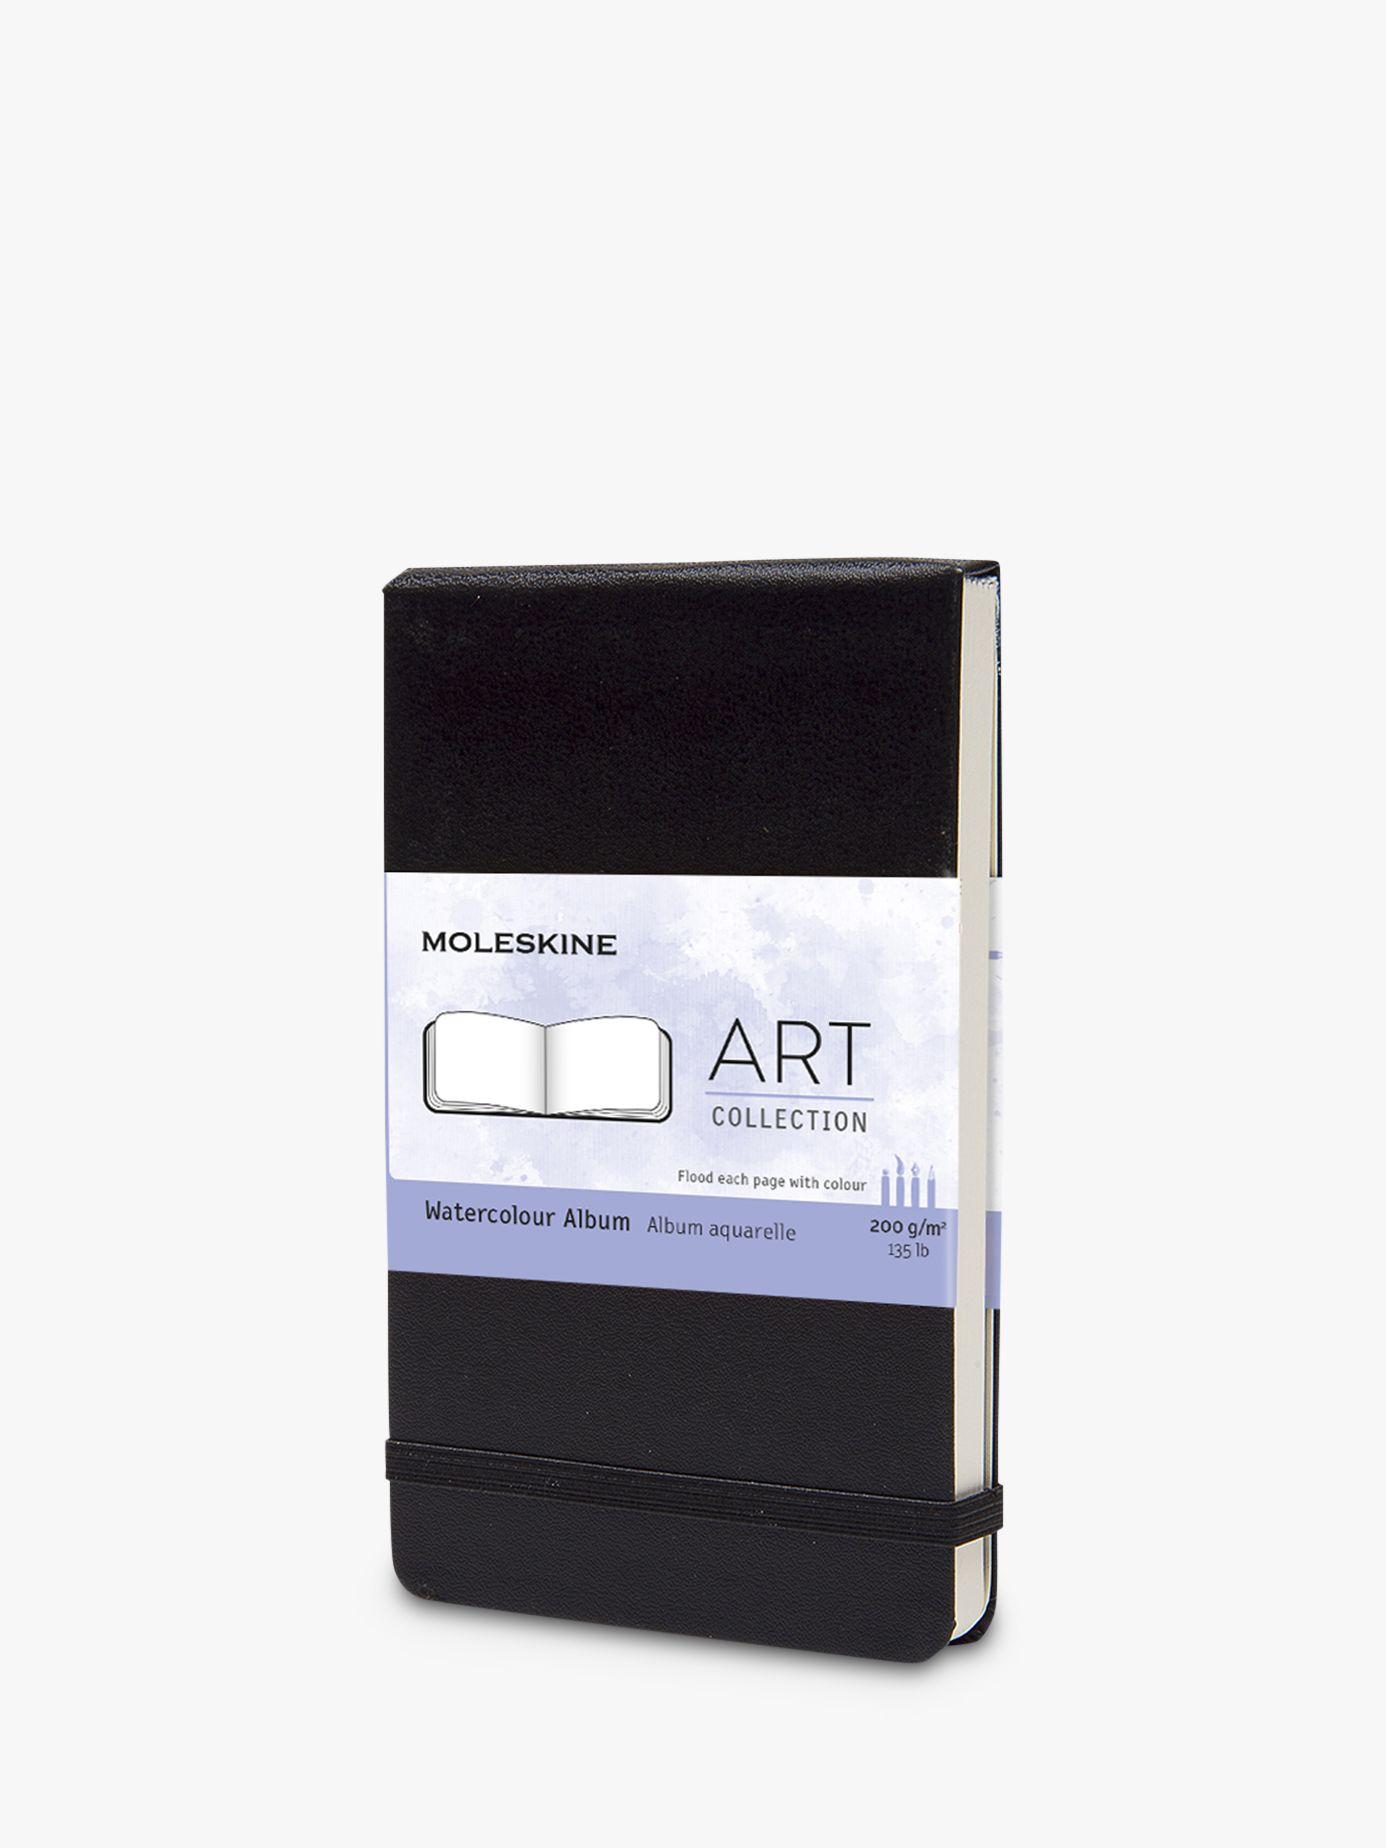 Moleskine Moleskine Pocket Art Watercolour Sketchbook